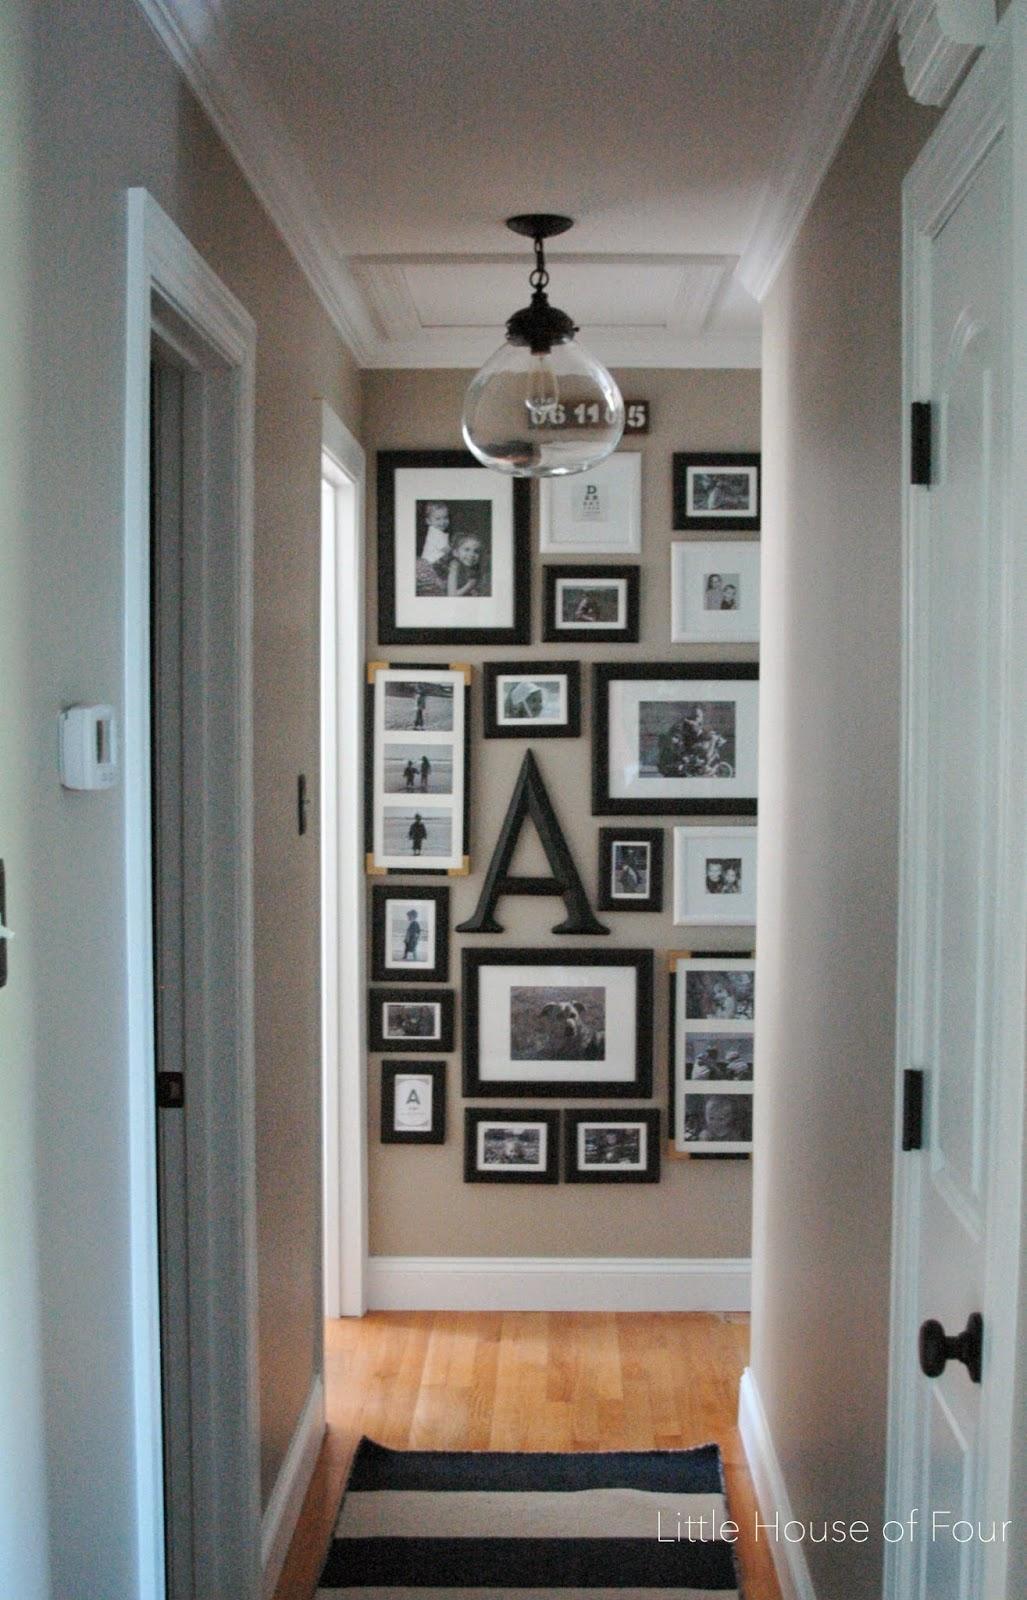 Hallway Decorating Ideas - Hall Storage and Design